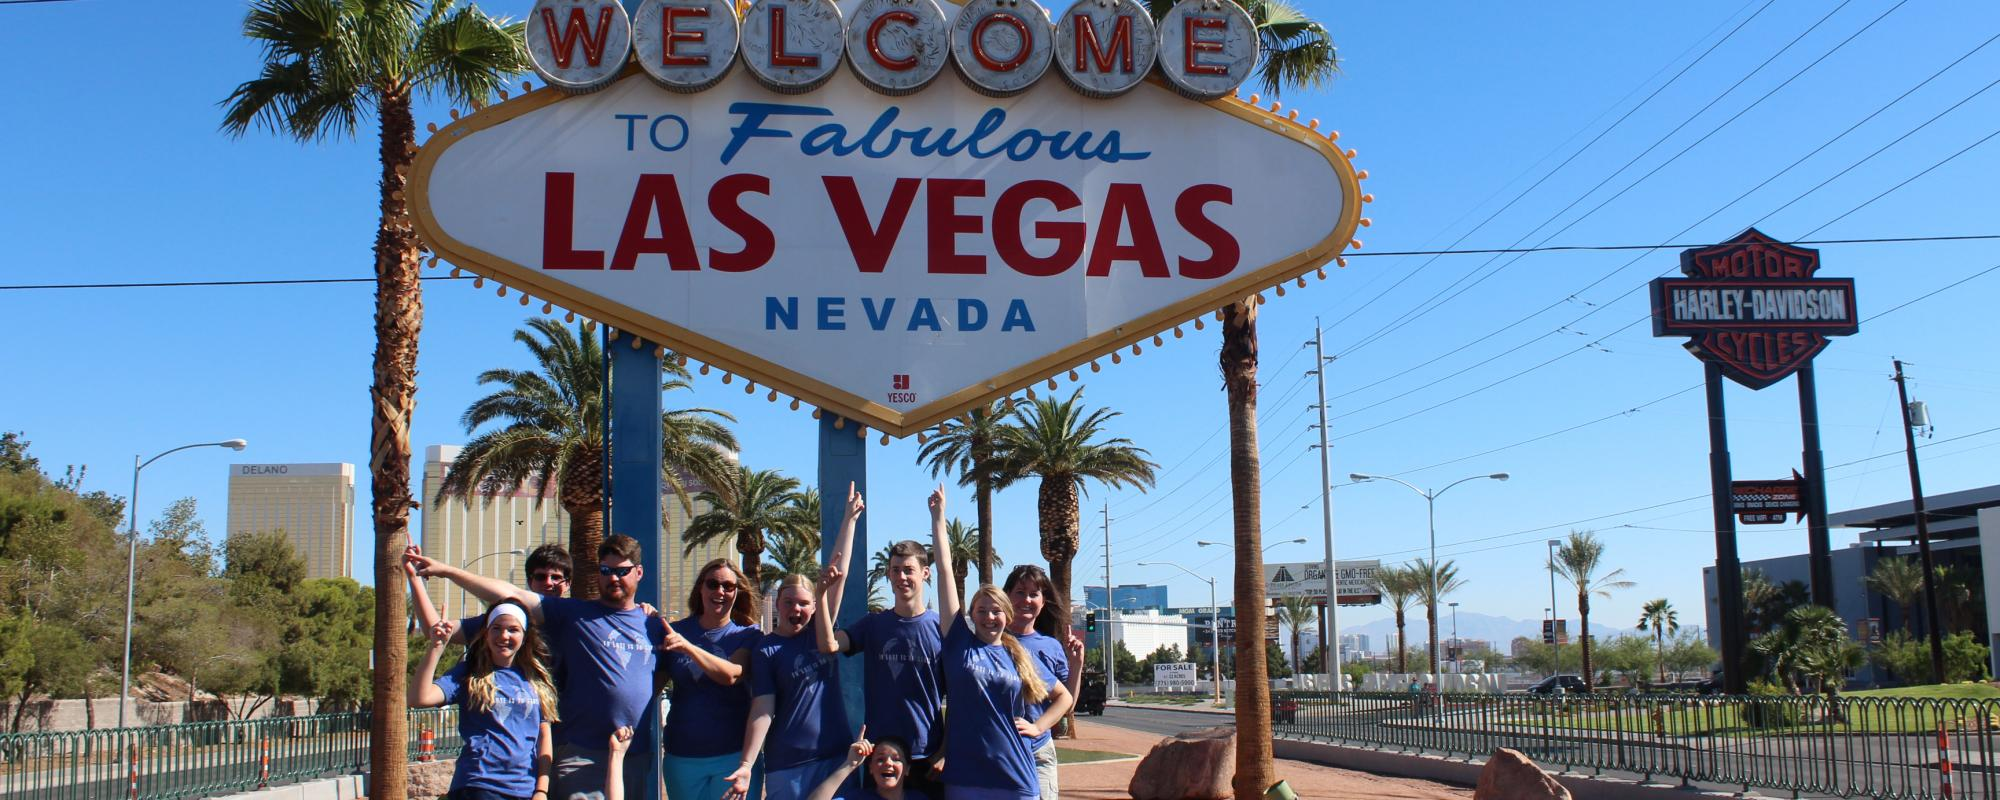 Las Vegas Mission Trip Group of People